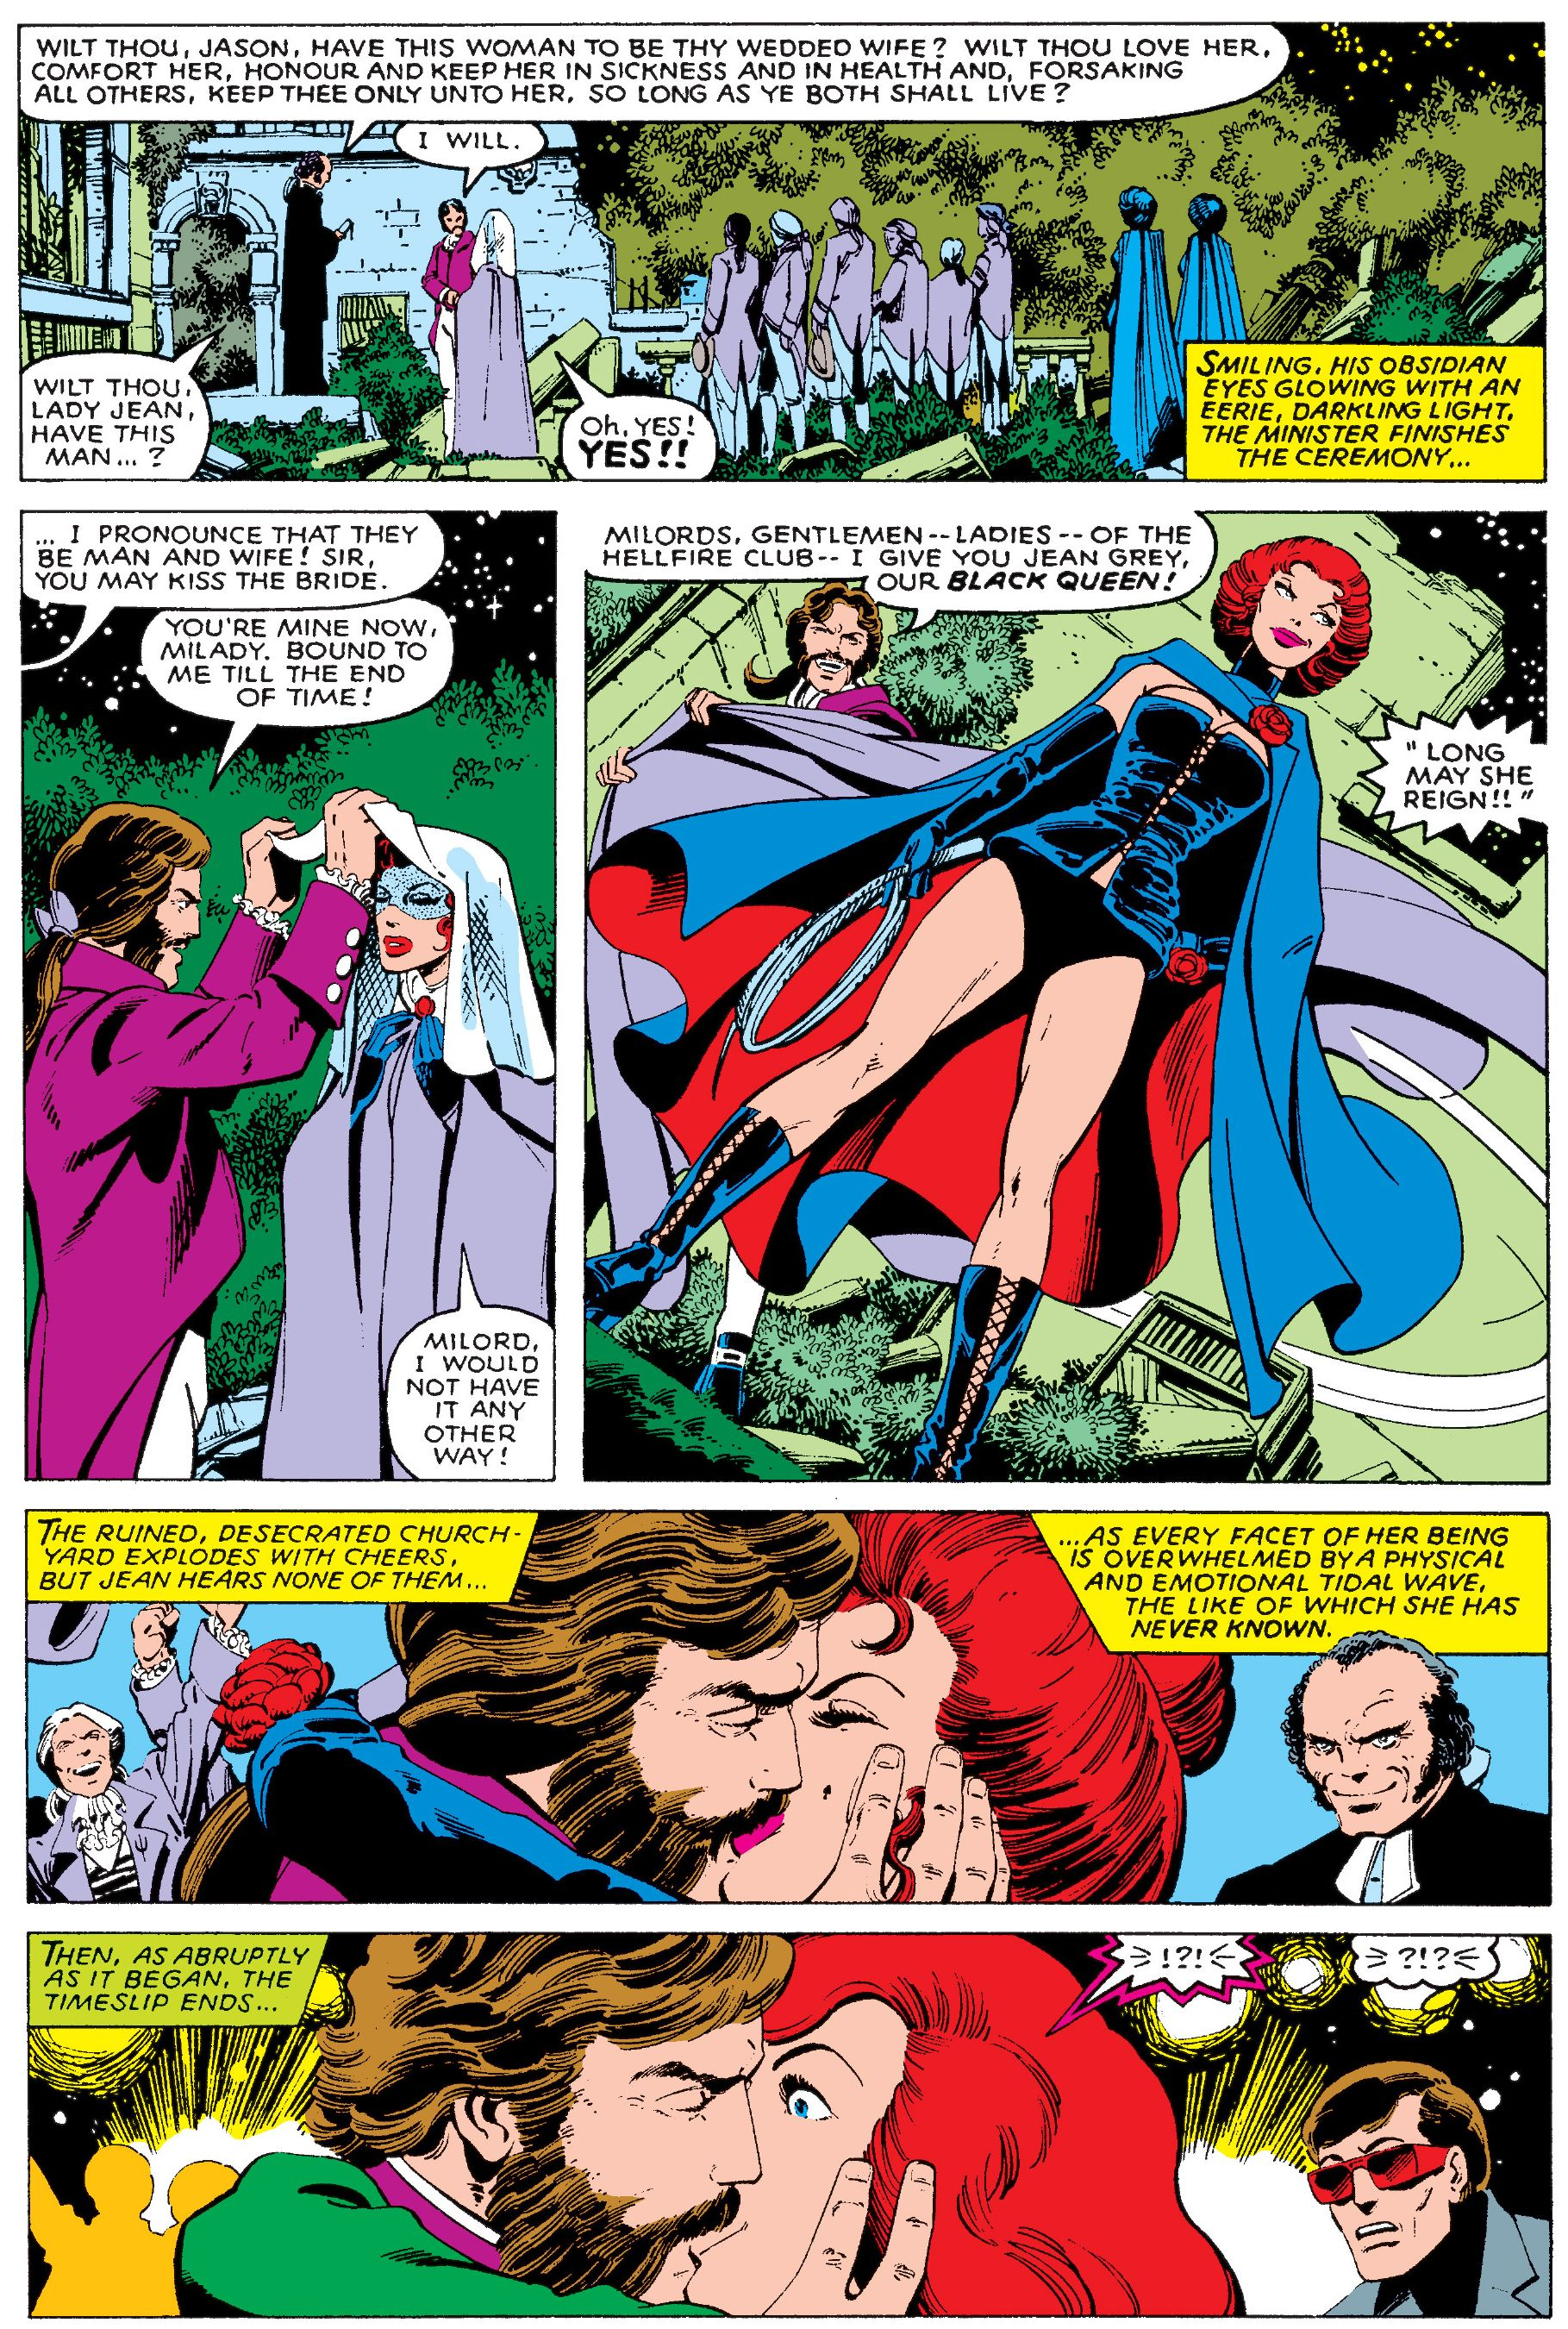 Uncanny X-Men  #130 (Marvel, February 1980), page 15